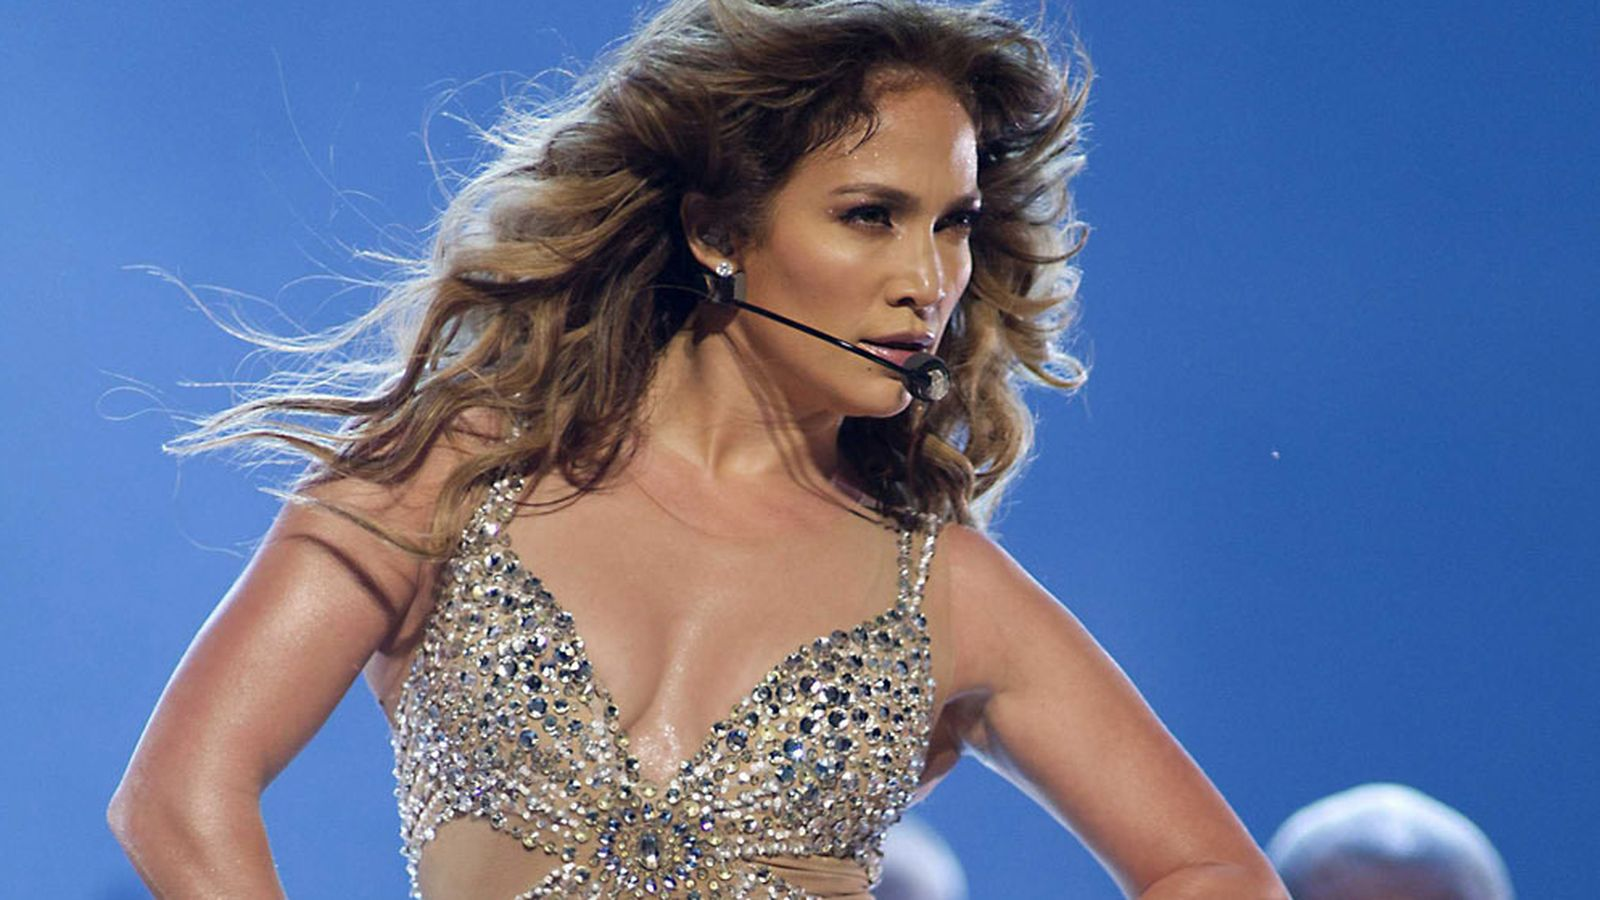 Foto: La cantante Jennifer López, en una imagen de archivo (Gtres)